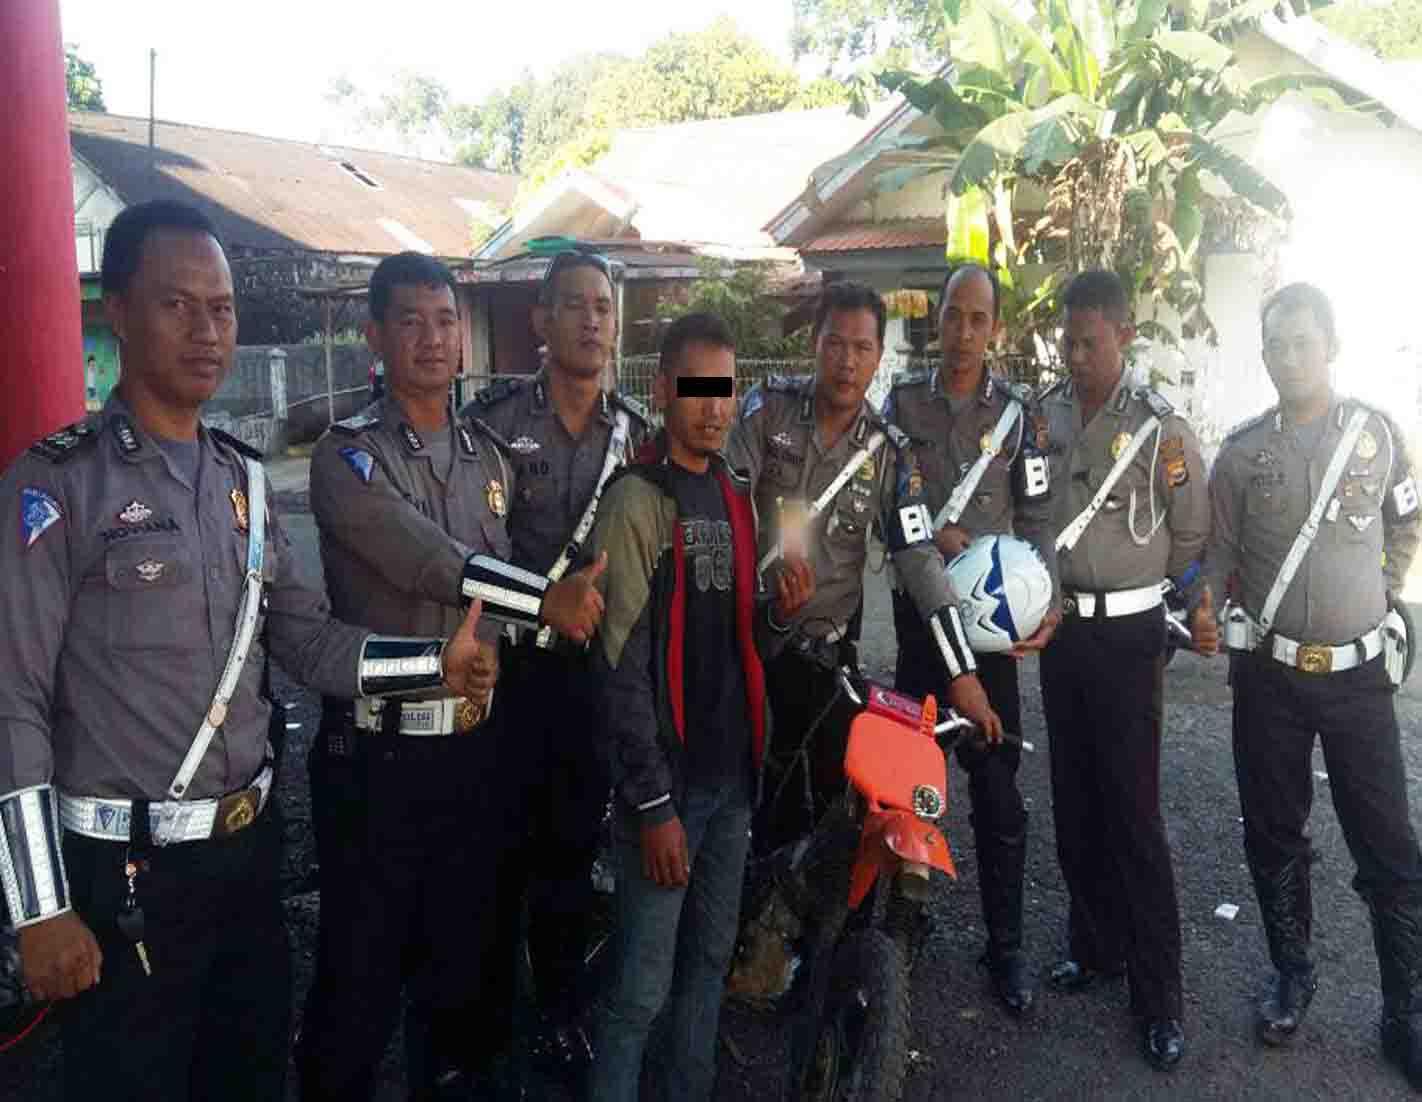 Bawa Biji Ganja, Seorang Petani Ditangkap Polantas Pos Puncak Kepahiang